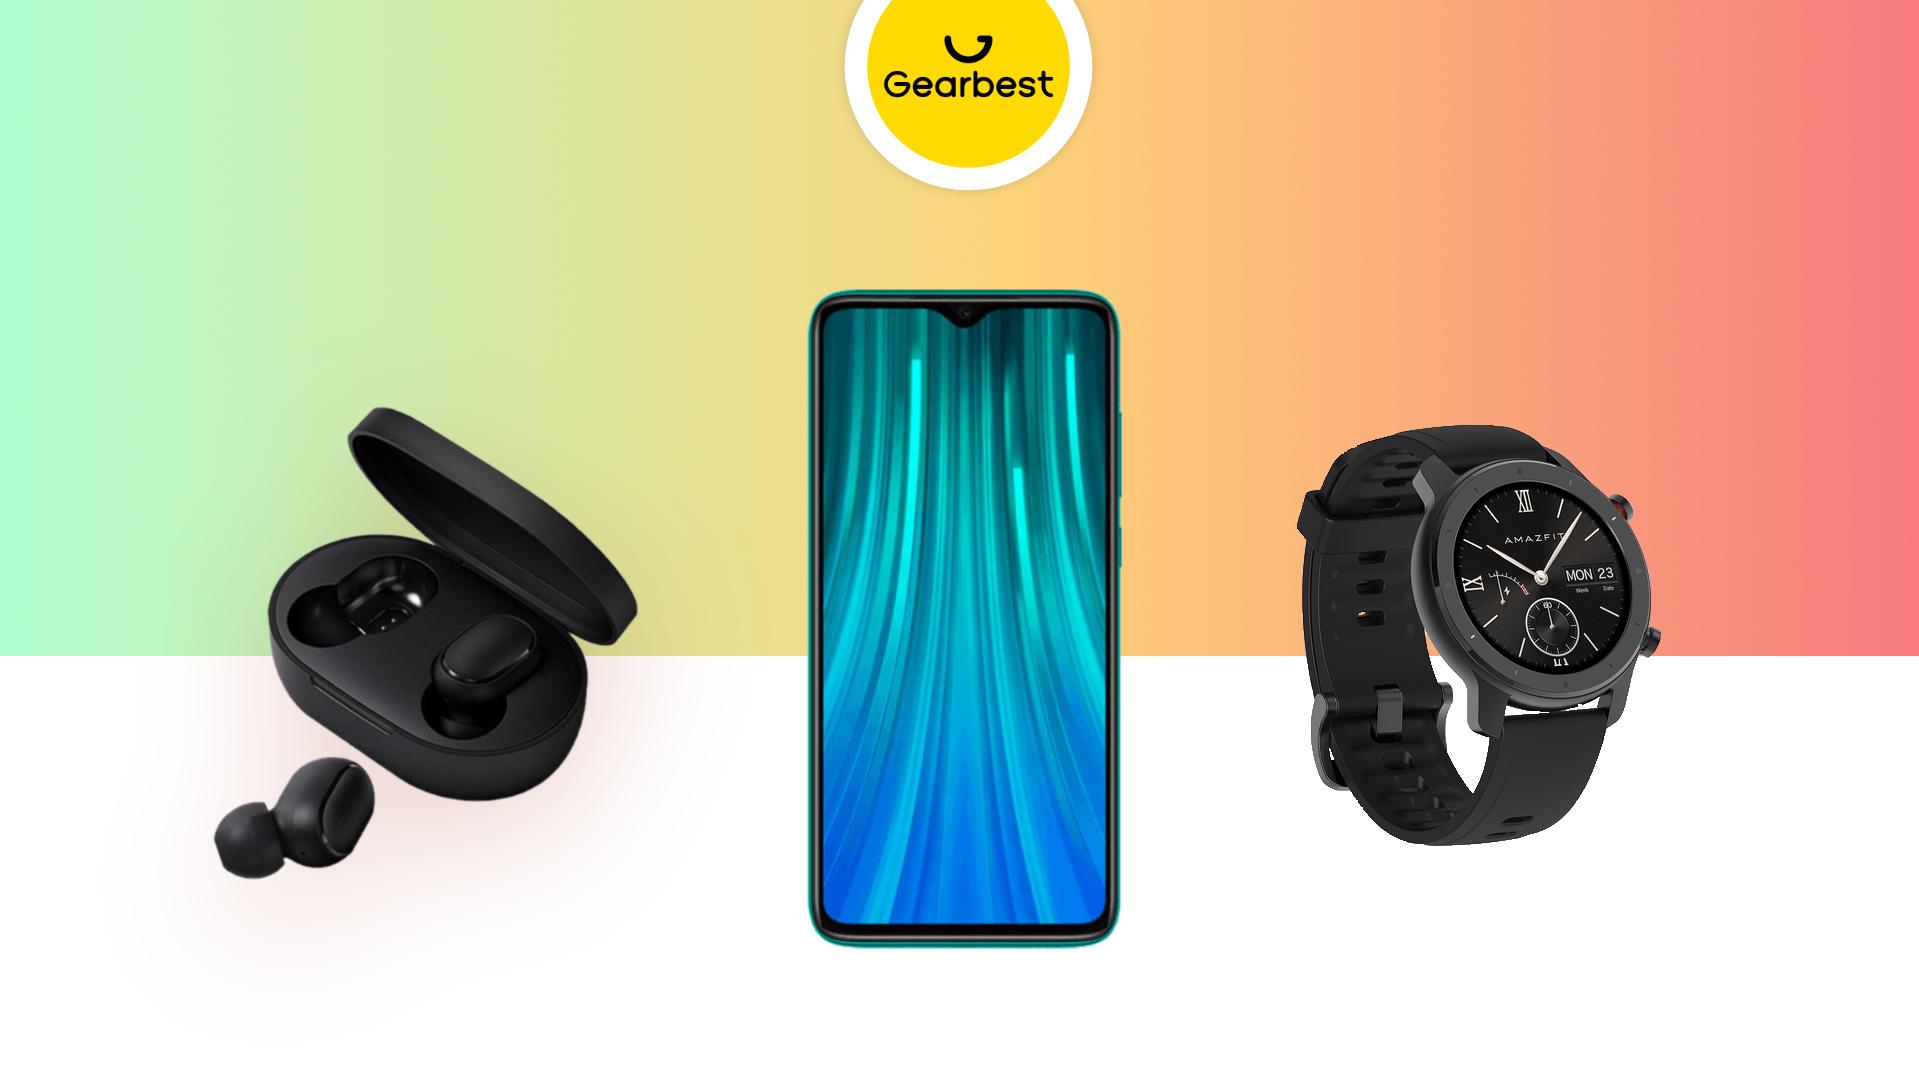 Redmi Note 8 Pro à 194 euros, Redmi Airdots à 17 euros et Amazfit GTR Lite à 100 euros